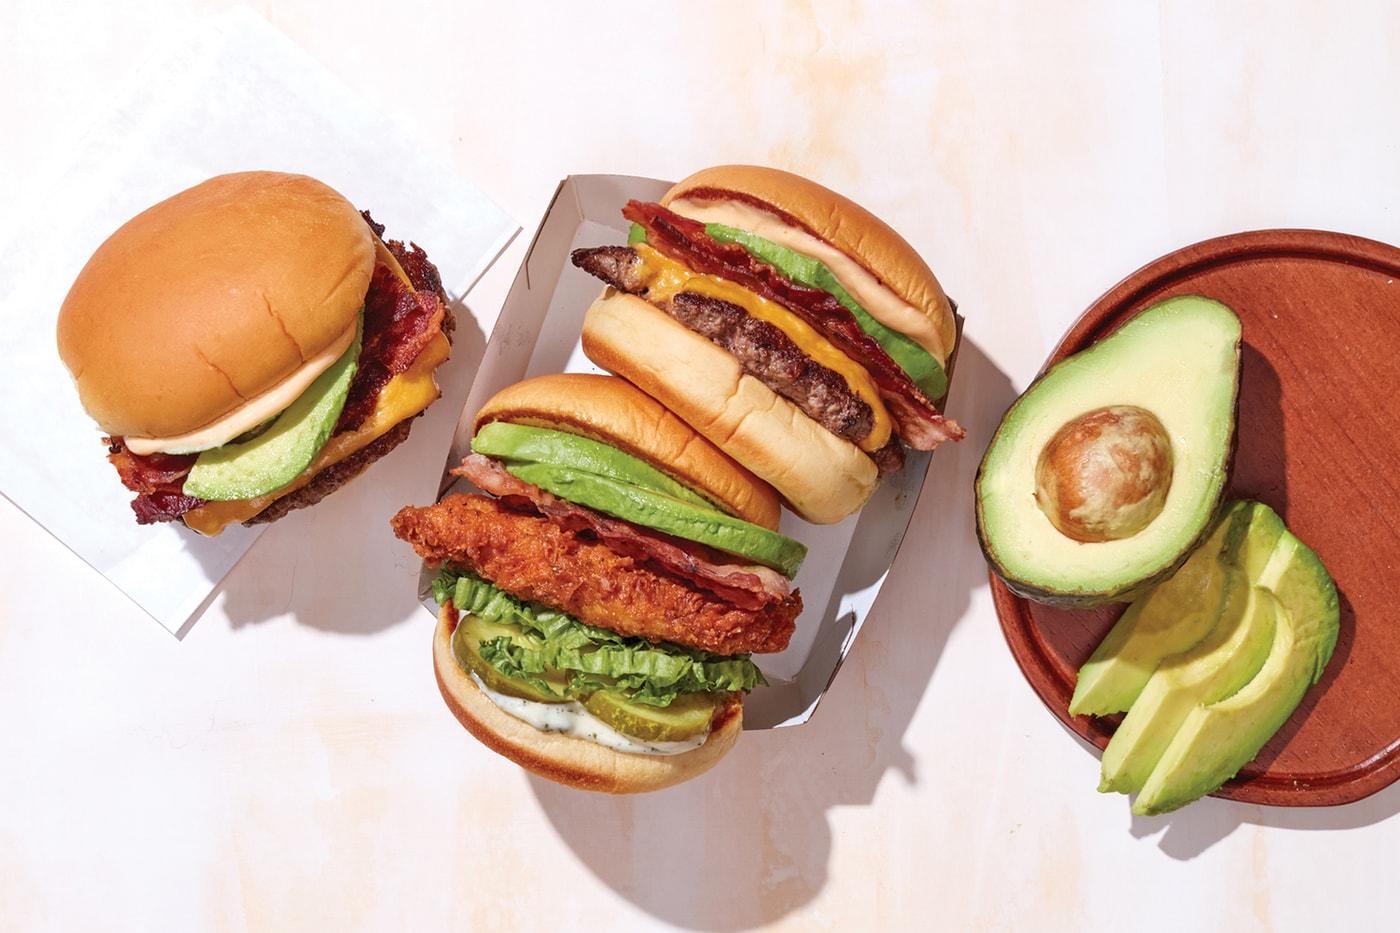 https%3A%2F%2Fhypebeast.com%2Fimage%2F2021%2F04%2Fshake-shack-new-avocado-bacon-menu-launch-1.jpg